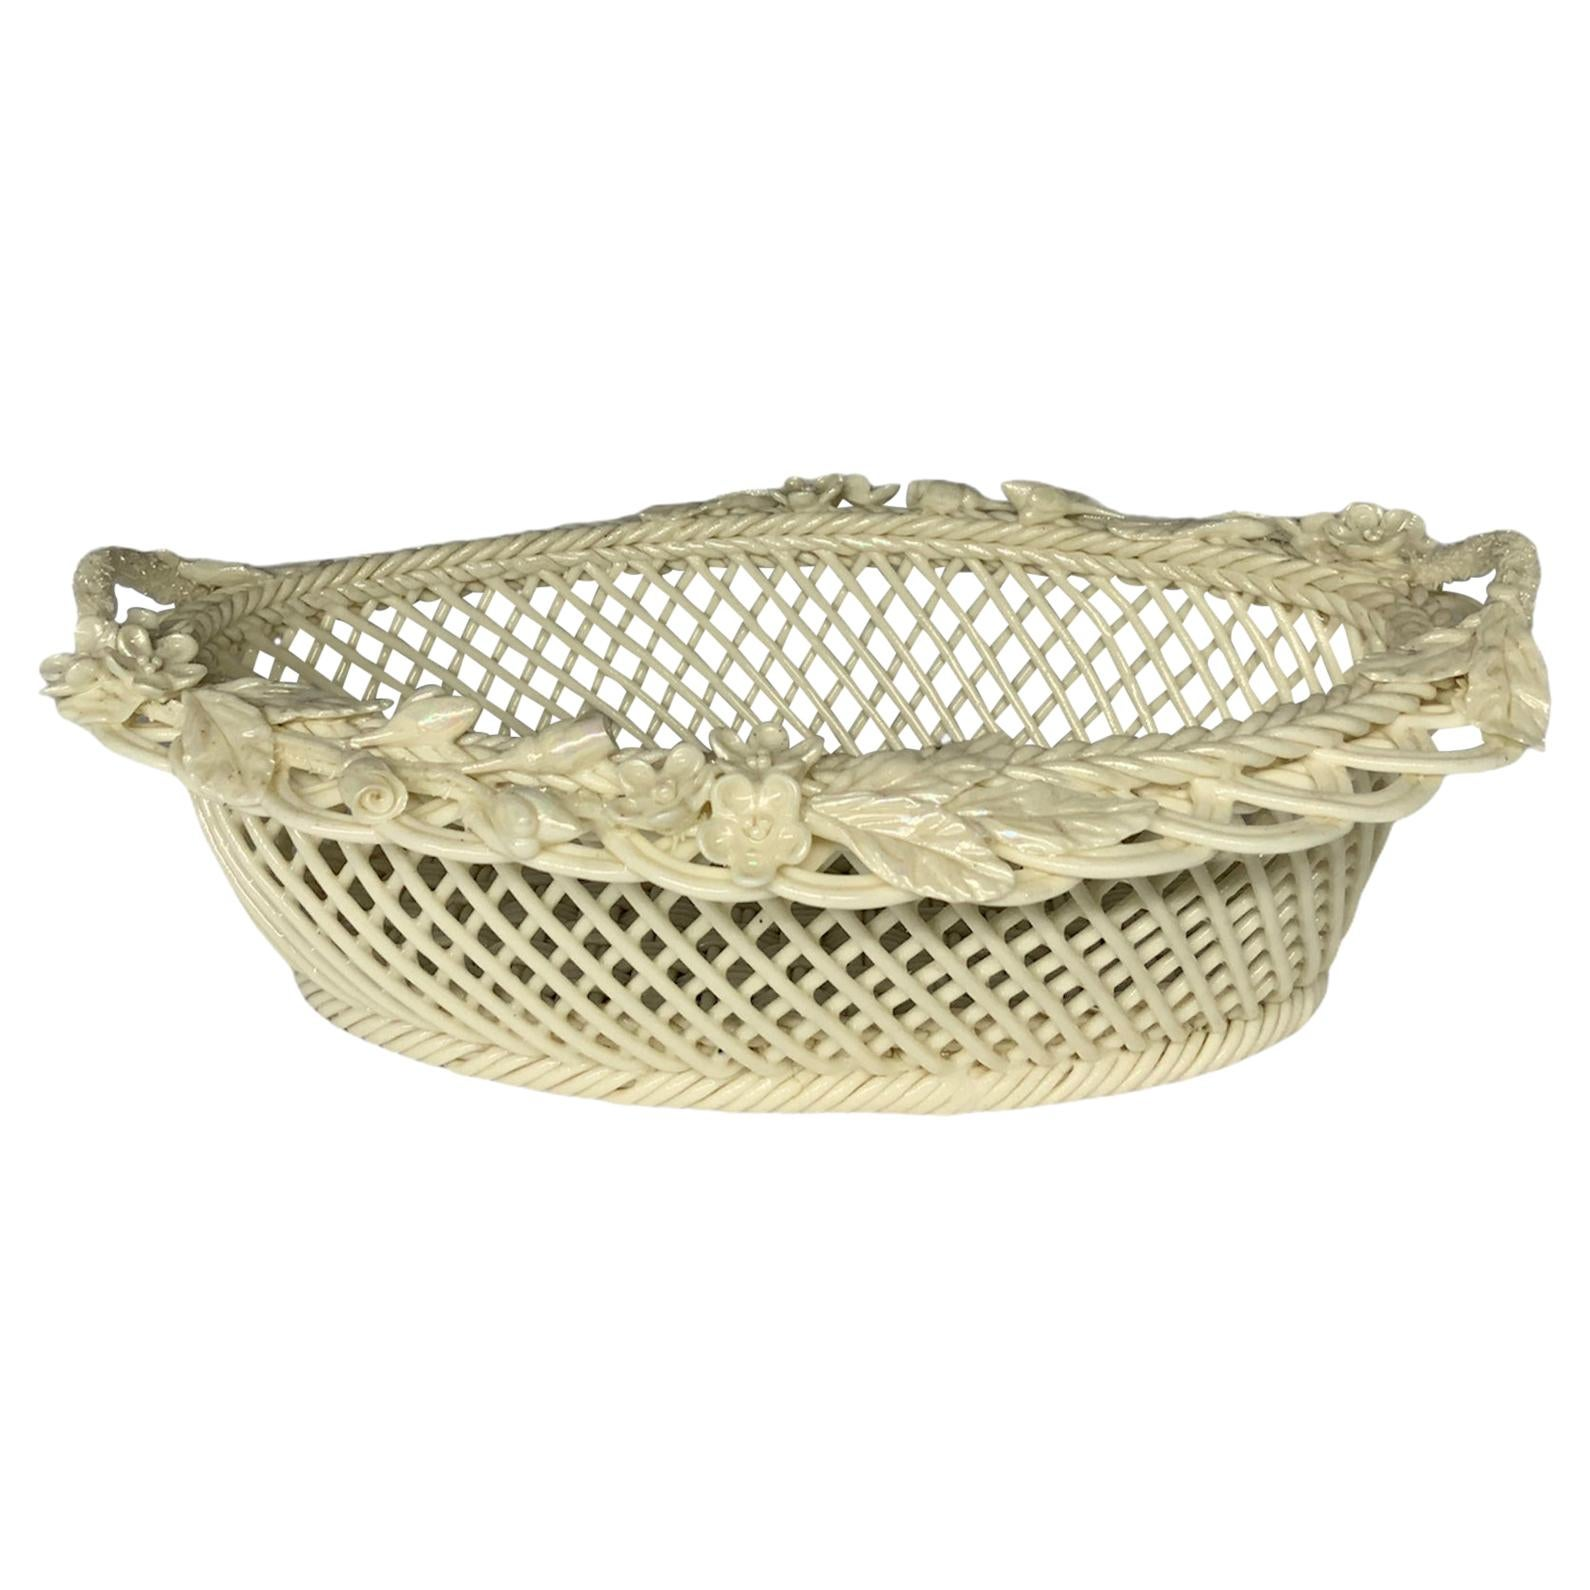 Belleek Pearly Paria Porcelain Woven Basket